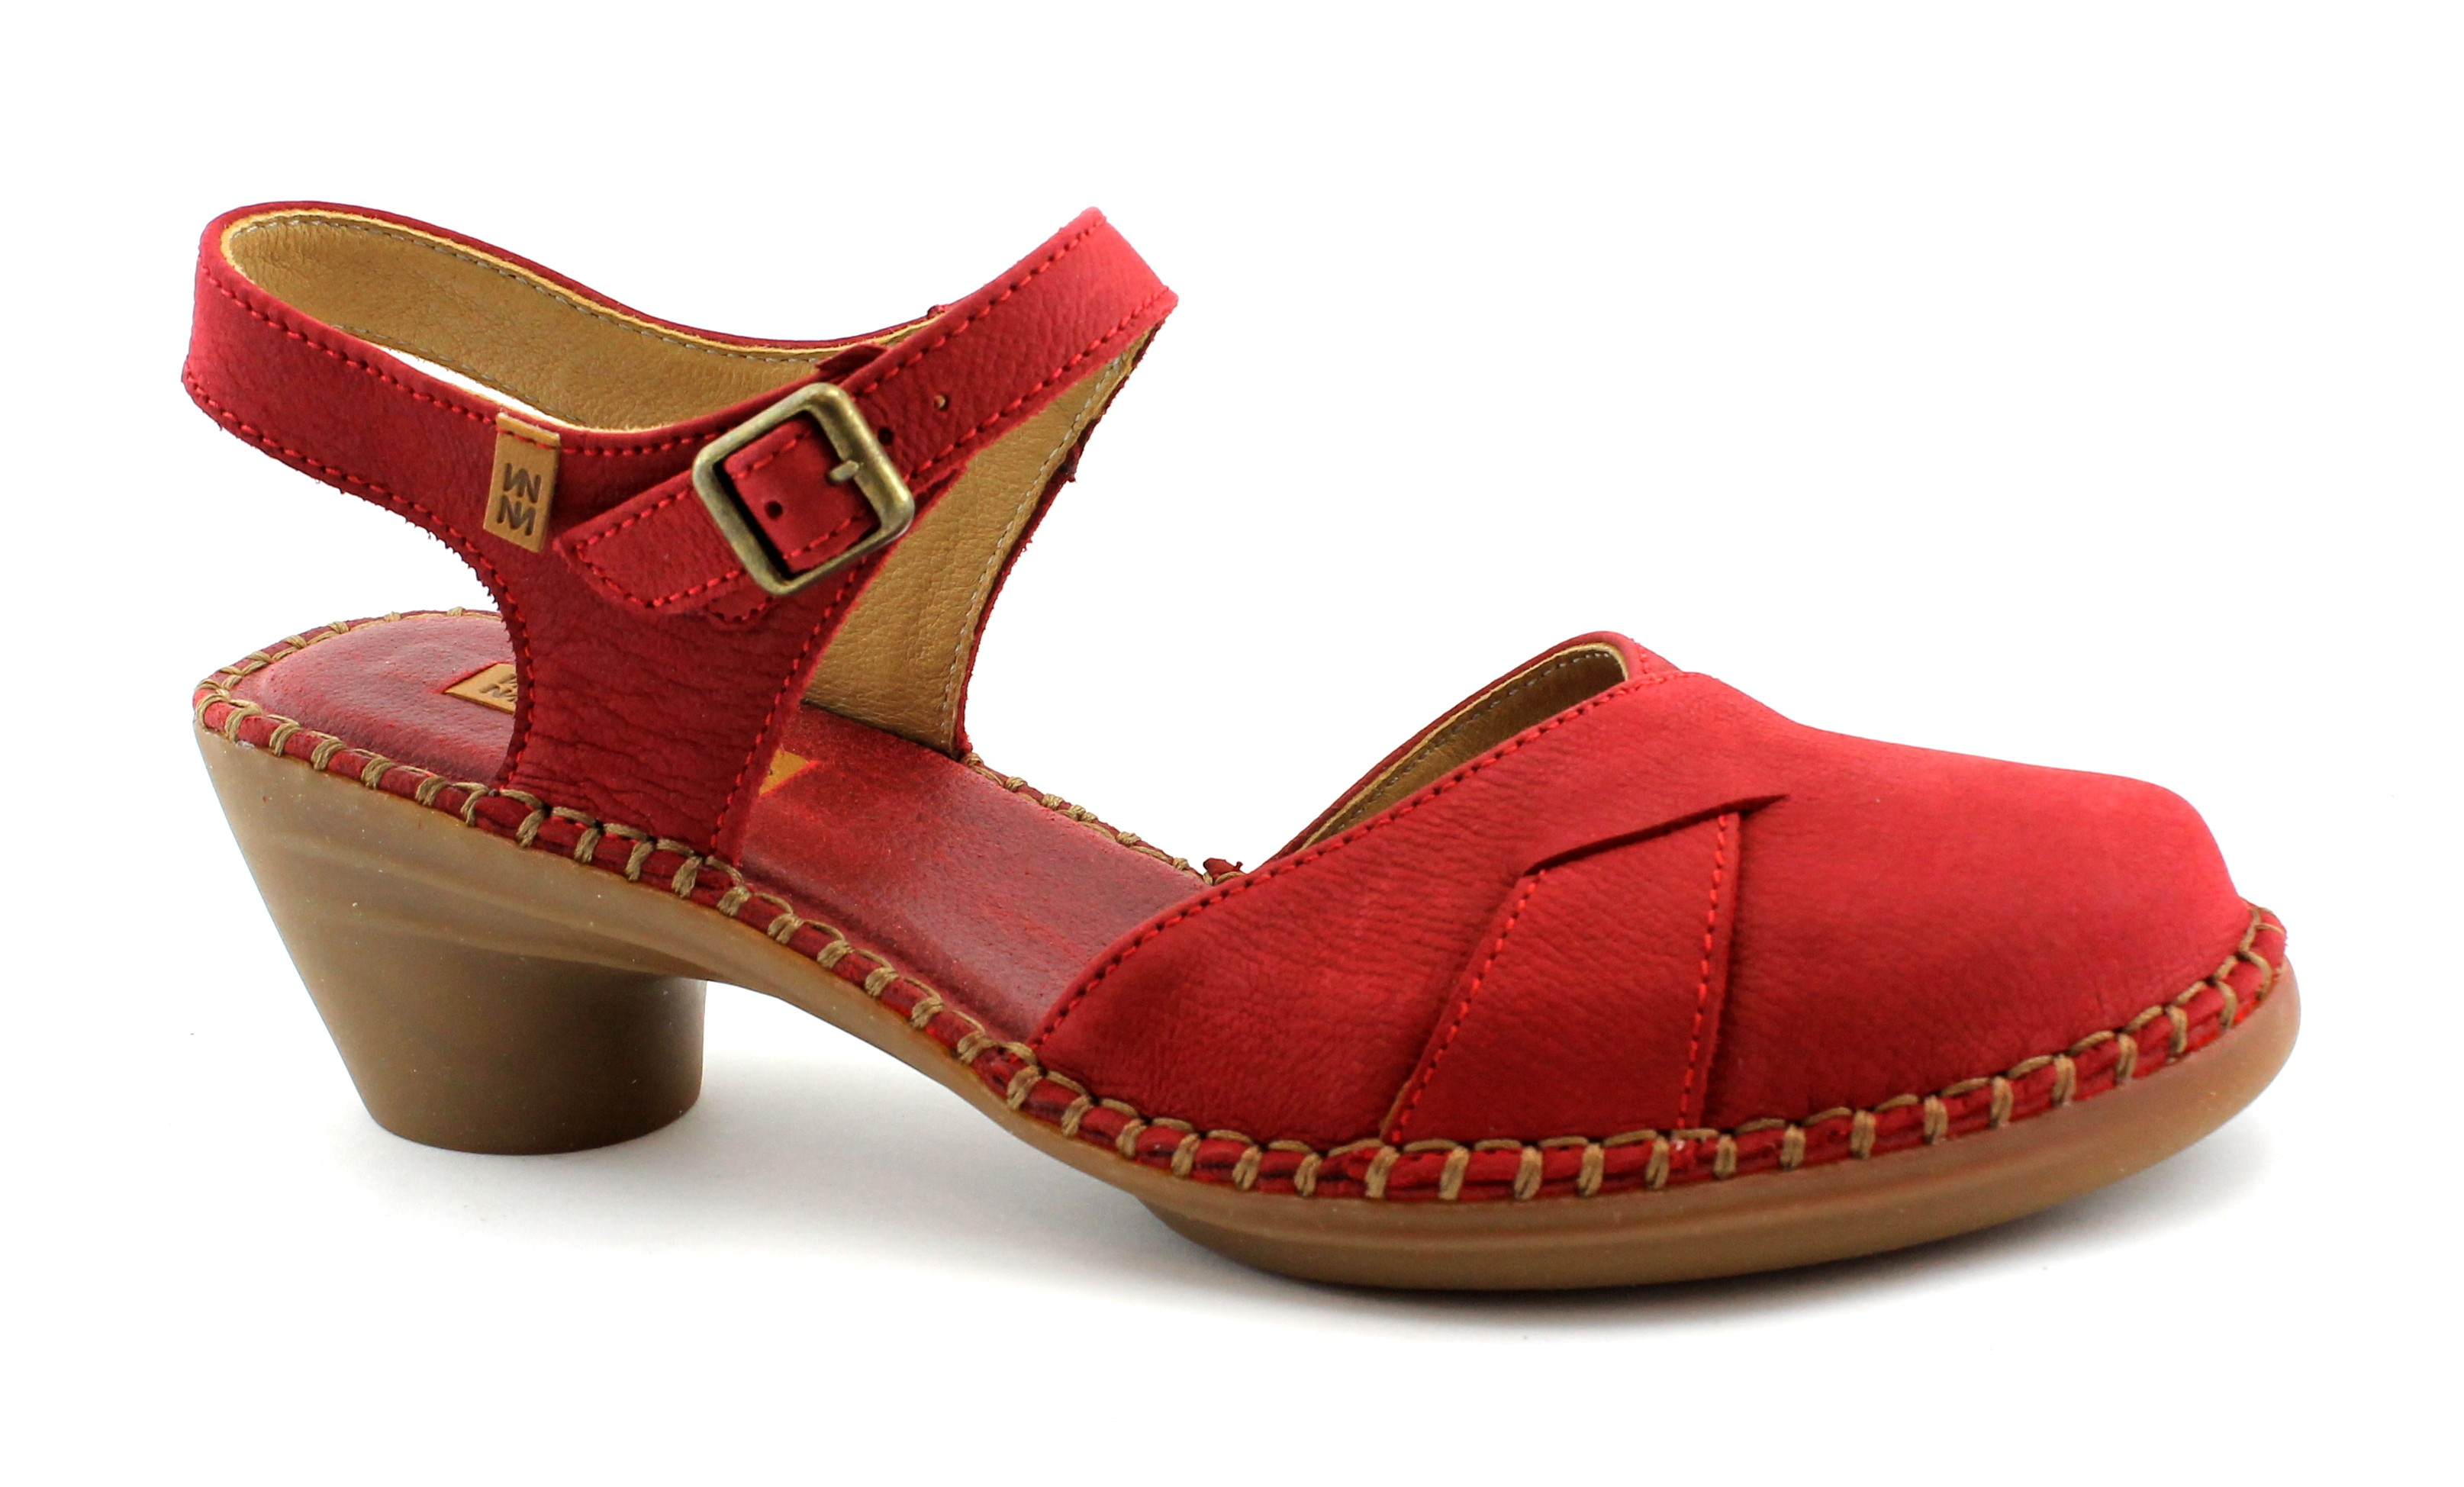 EL NATURALISTA 5324 AQUA tibet rosso sandalo donna tacco cinturino punta chiusa